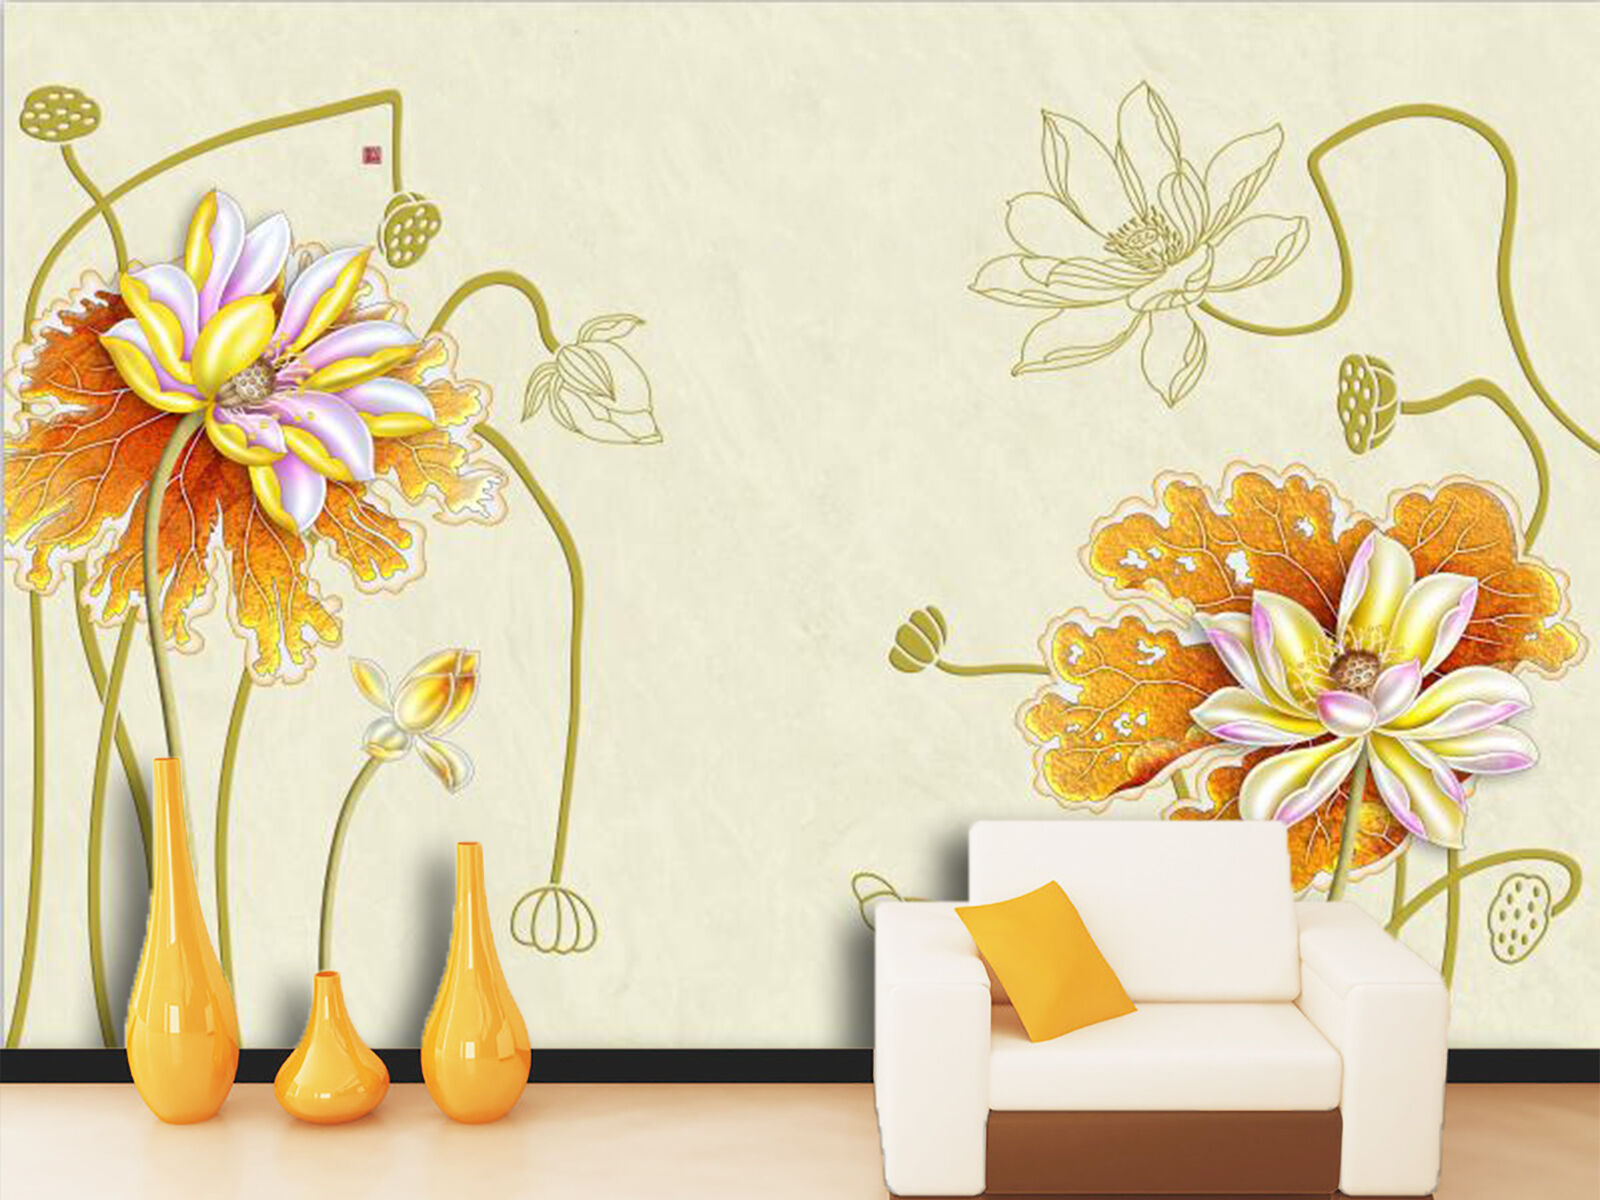 3D Golden Lotus Flower Flower Flower Plant 62 Wall Paper Wall Print Decal Wall AJ WALLPAPER CA 50c69c